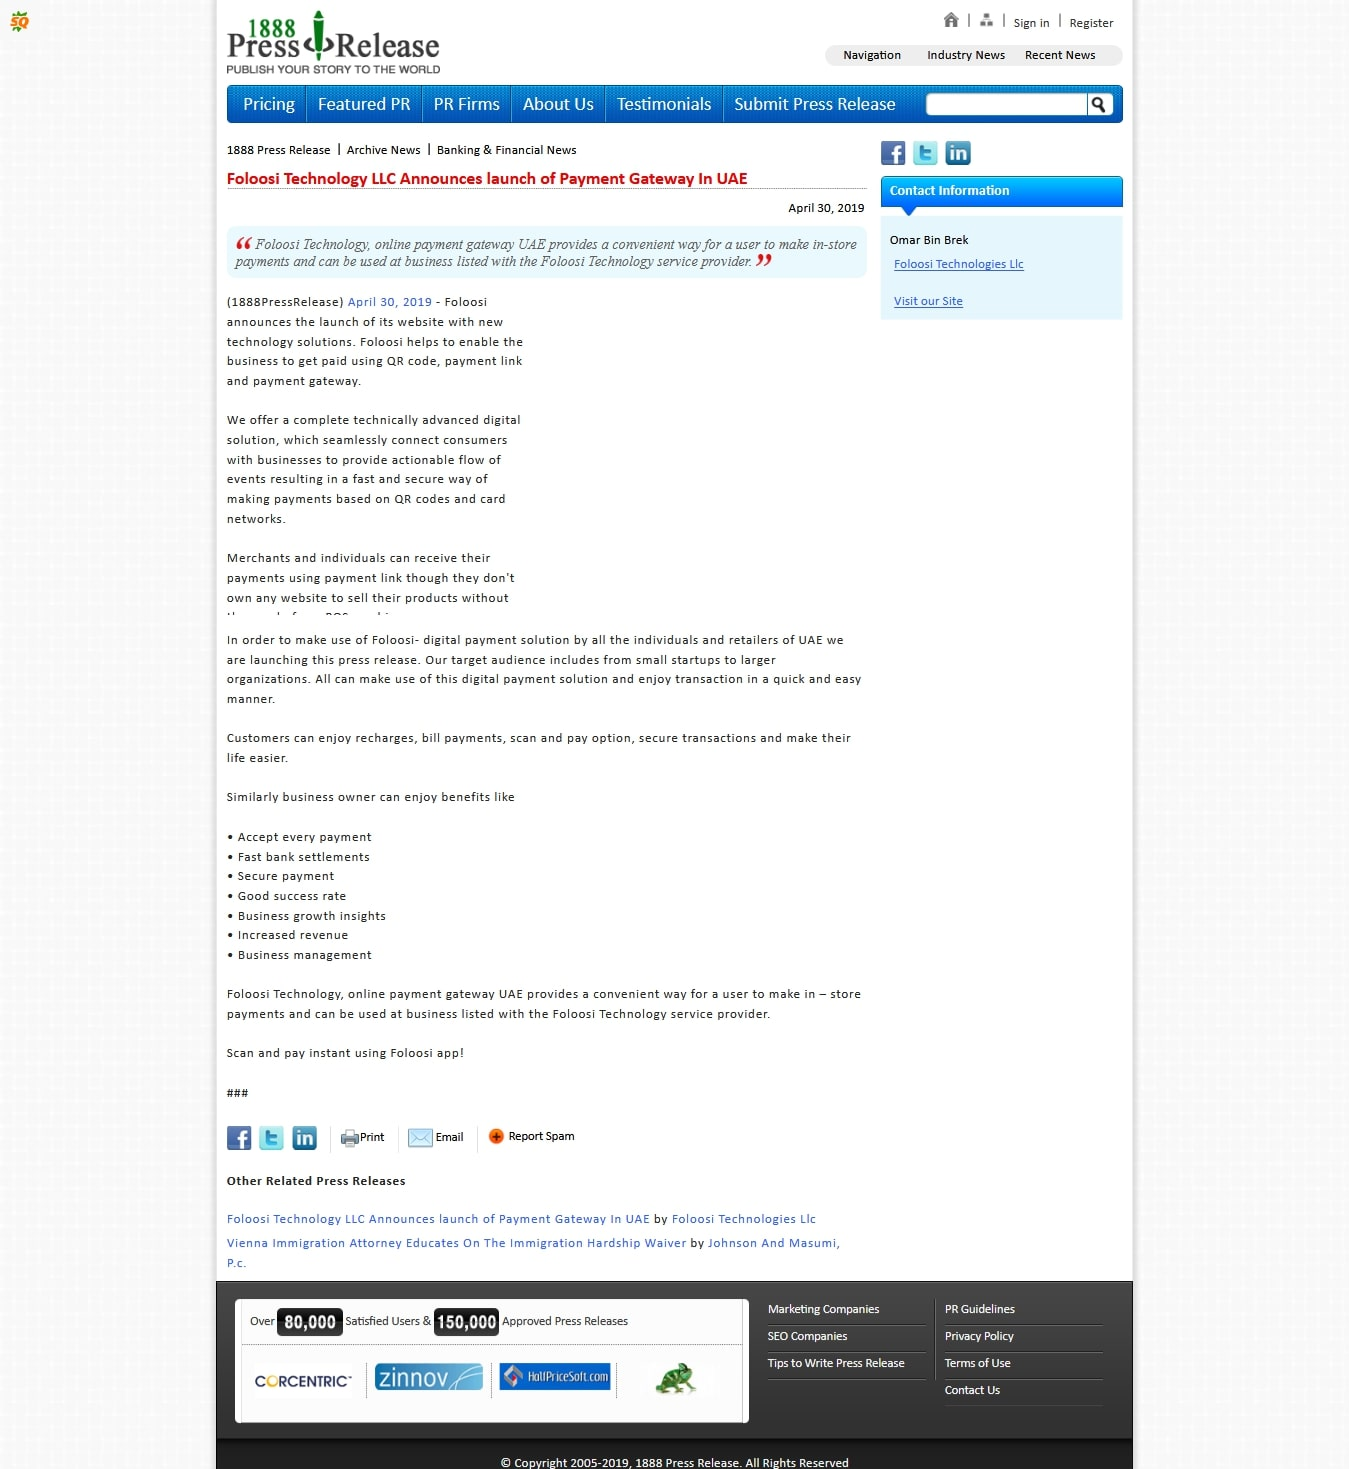 foloosi-announces-launch-of-payment-gateway-uae